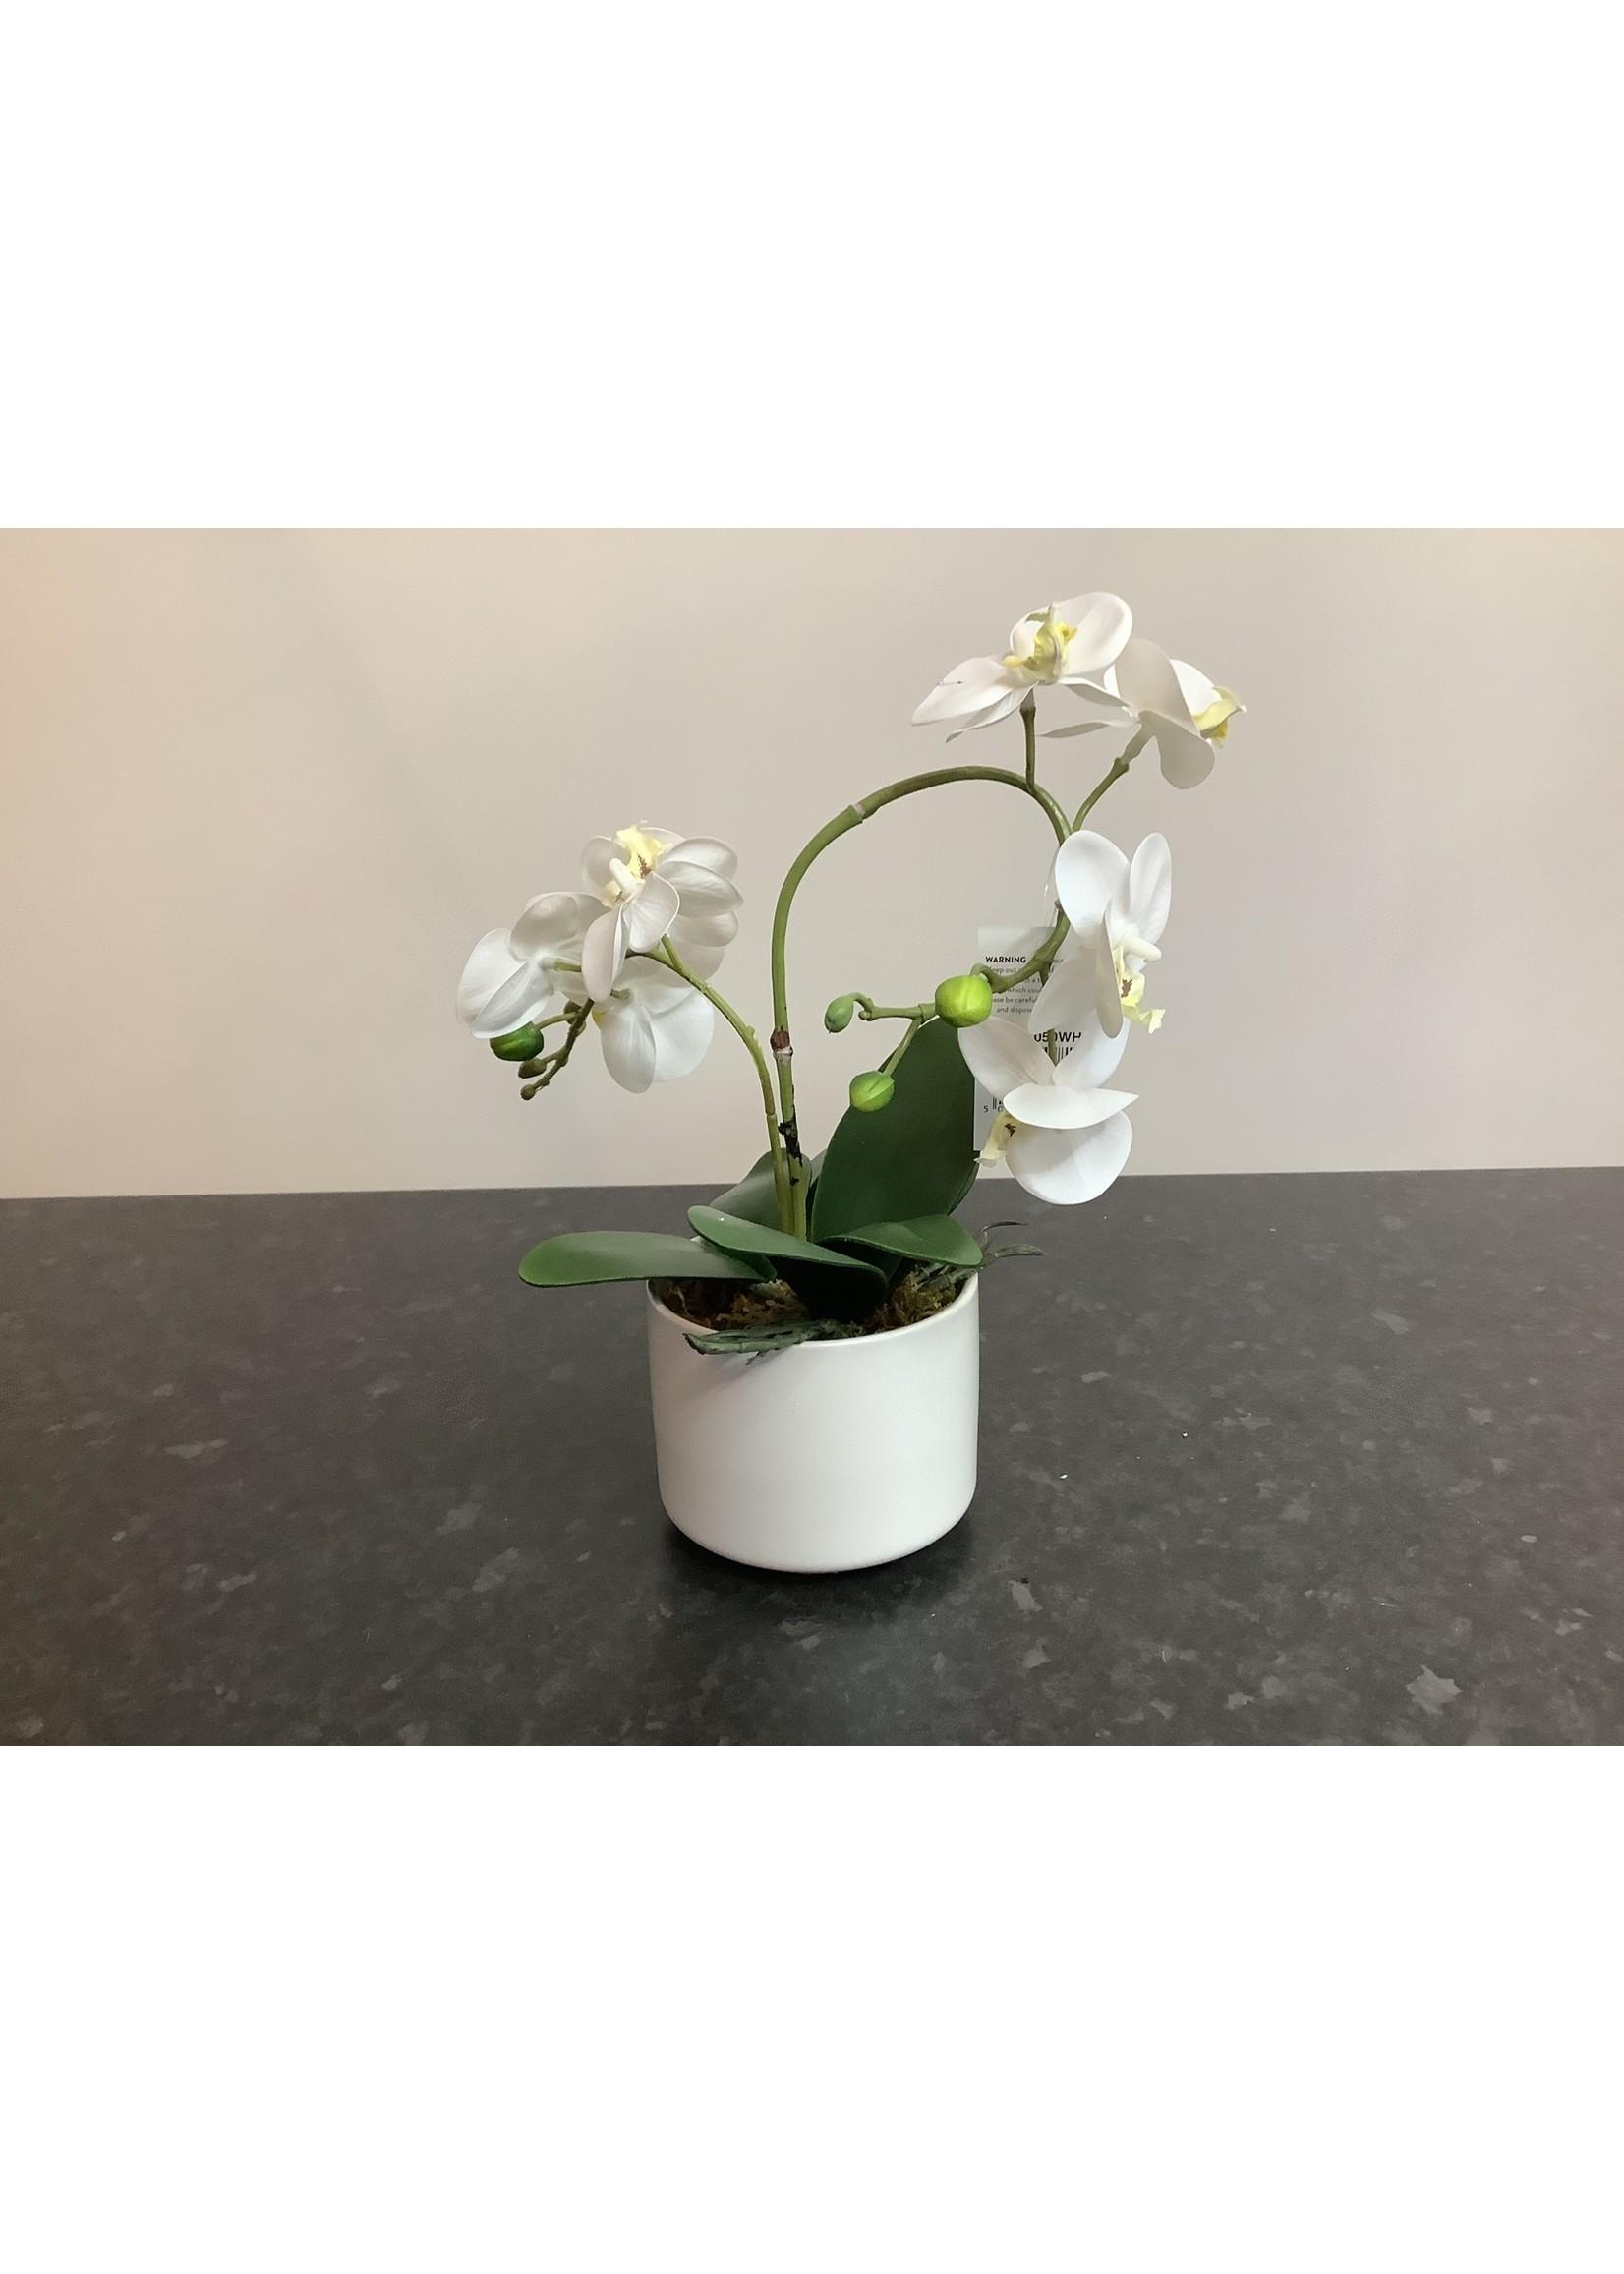 Small orchid arrangement 26cm tall